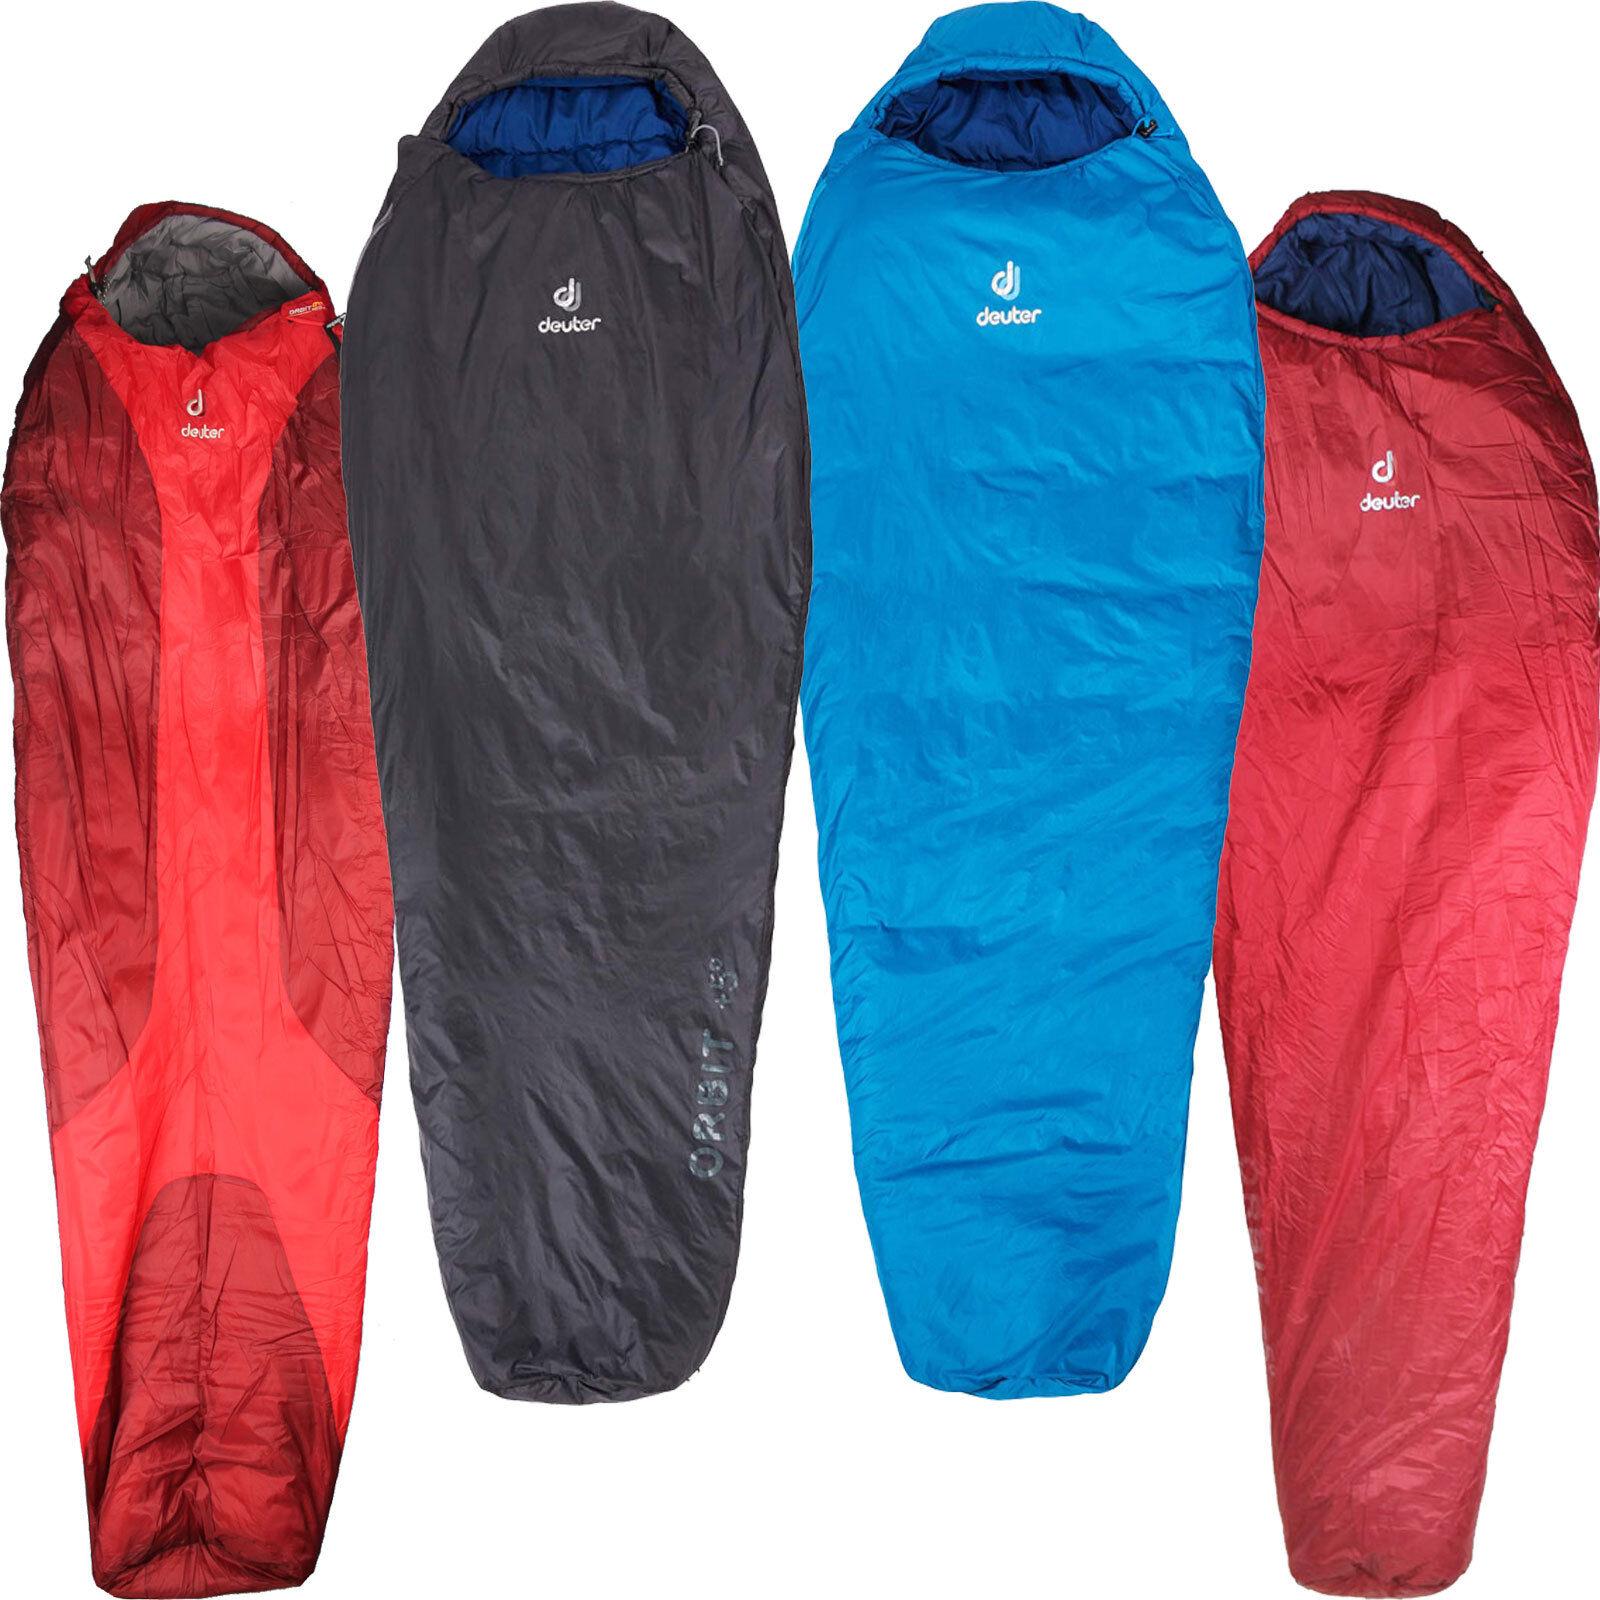 Deuter Orbit Unisex Sleeping Bag Mummy Lightweight Camping